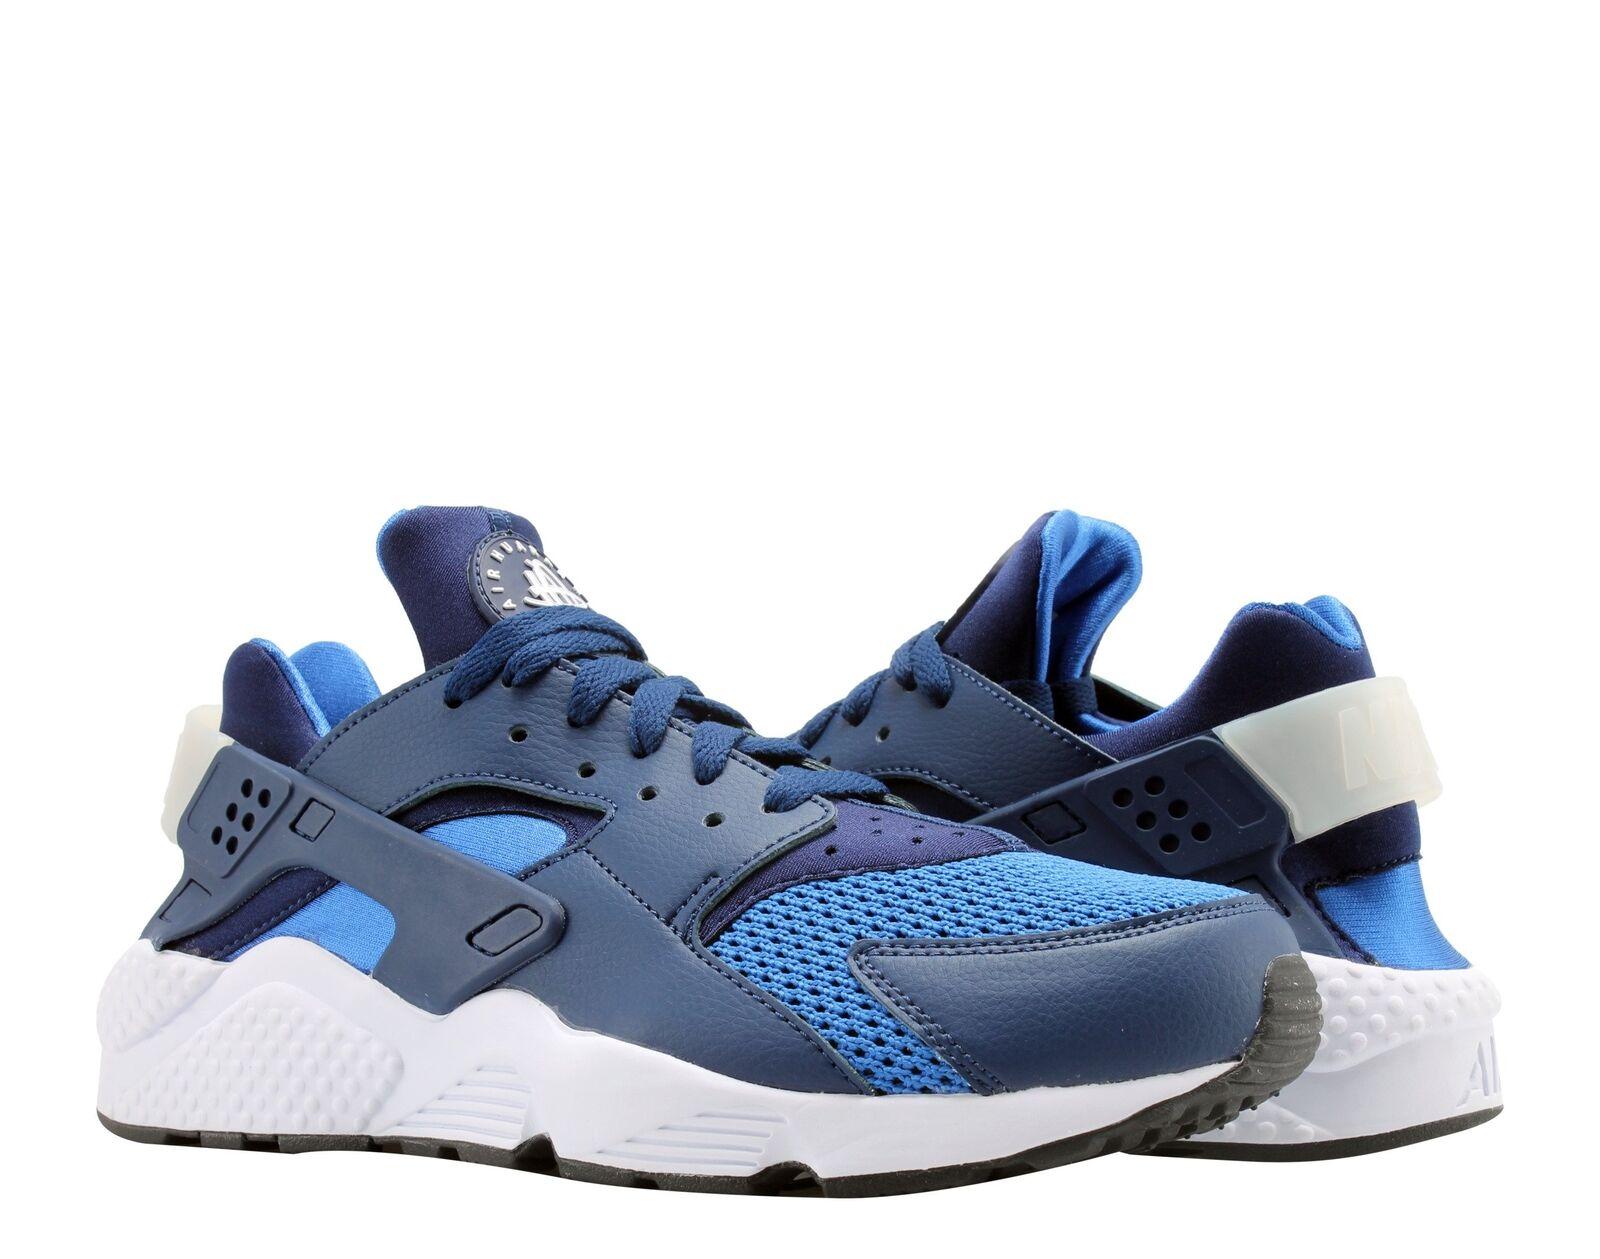 Nike / air huarache blu vuoto / Nike blu vuoto, gli uomini bianchi, scarpe da corsa 318429-421 182210